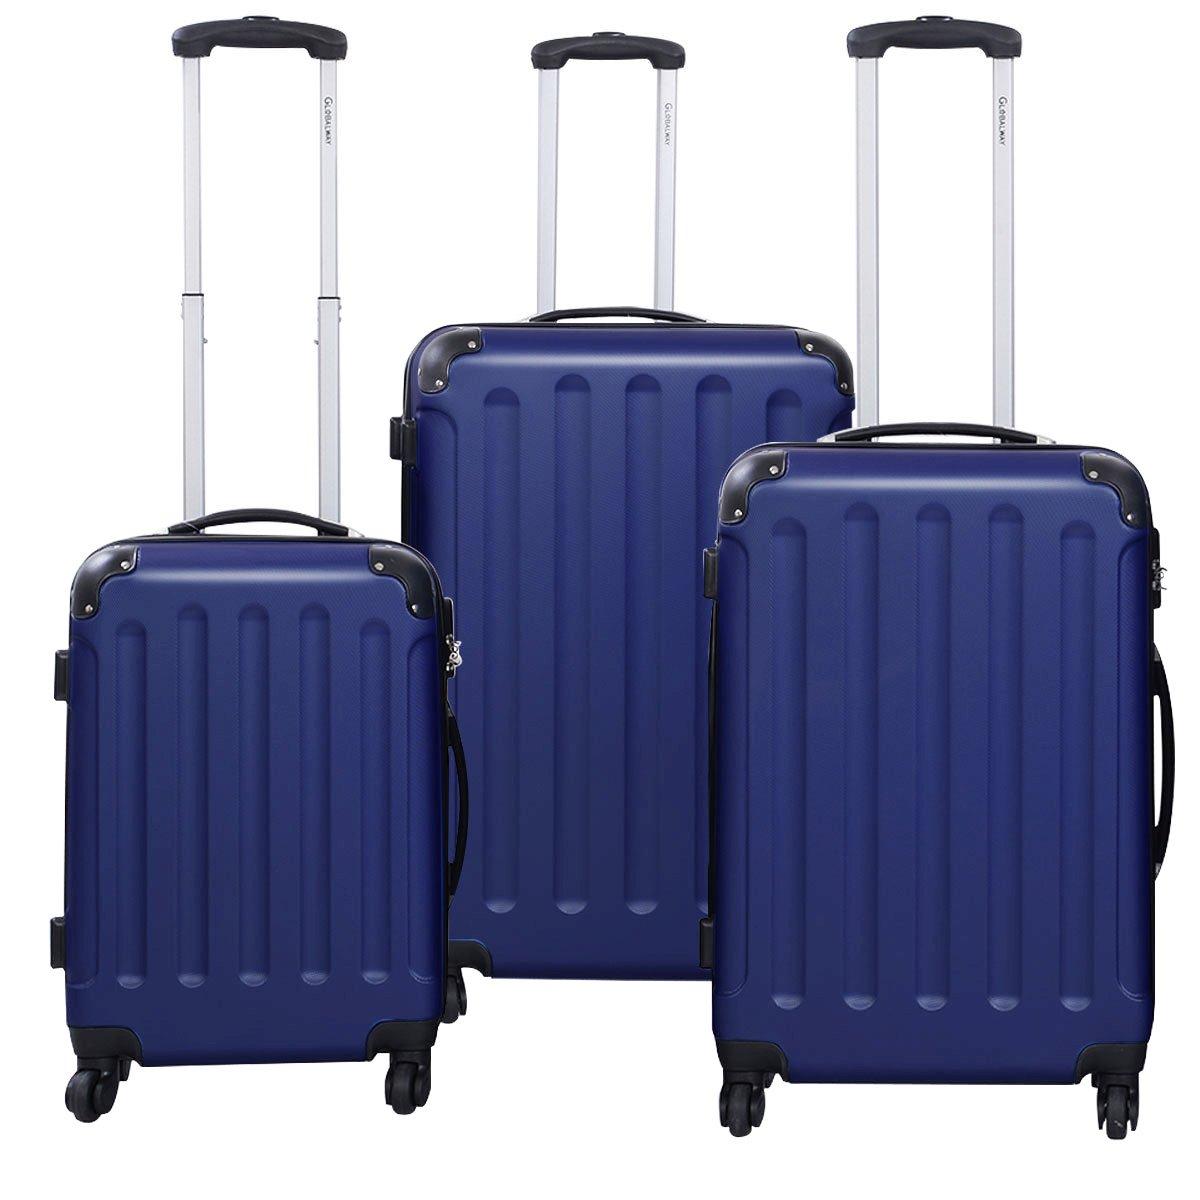 Goplus 3 Pcs Luggage Set Hardside Travel Rolling Suitcase ABS Globalway (Dark Blue)